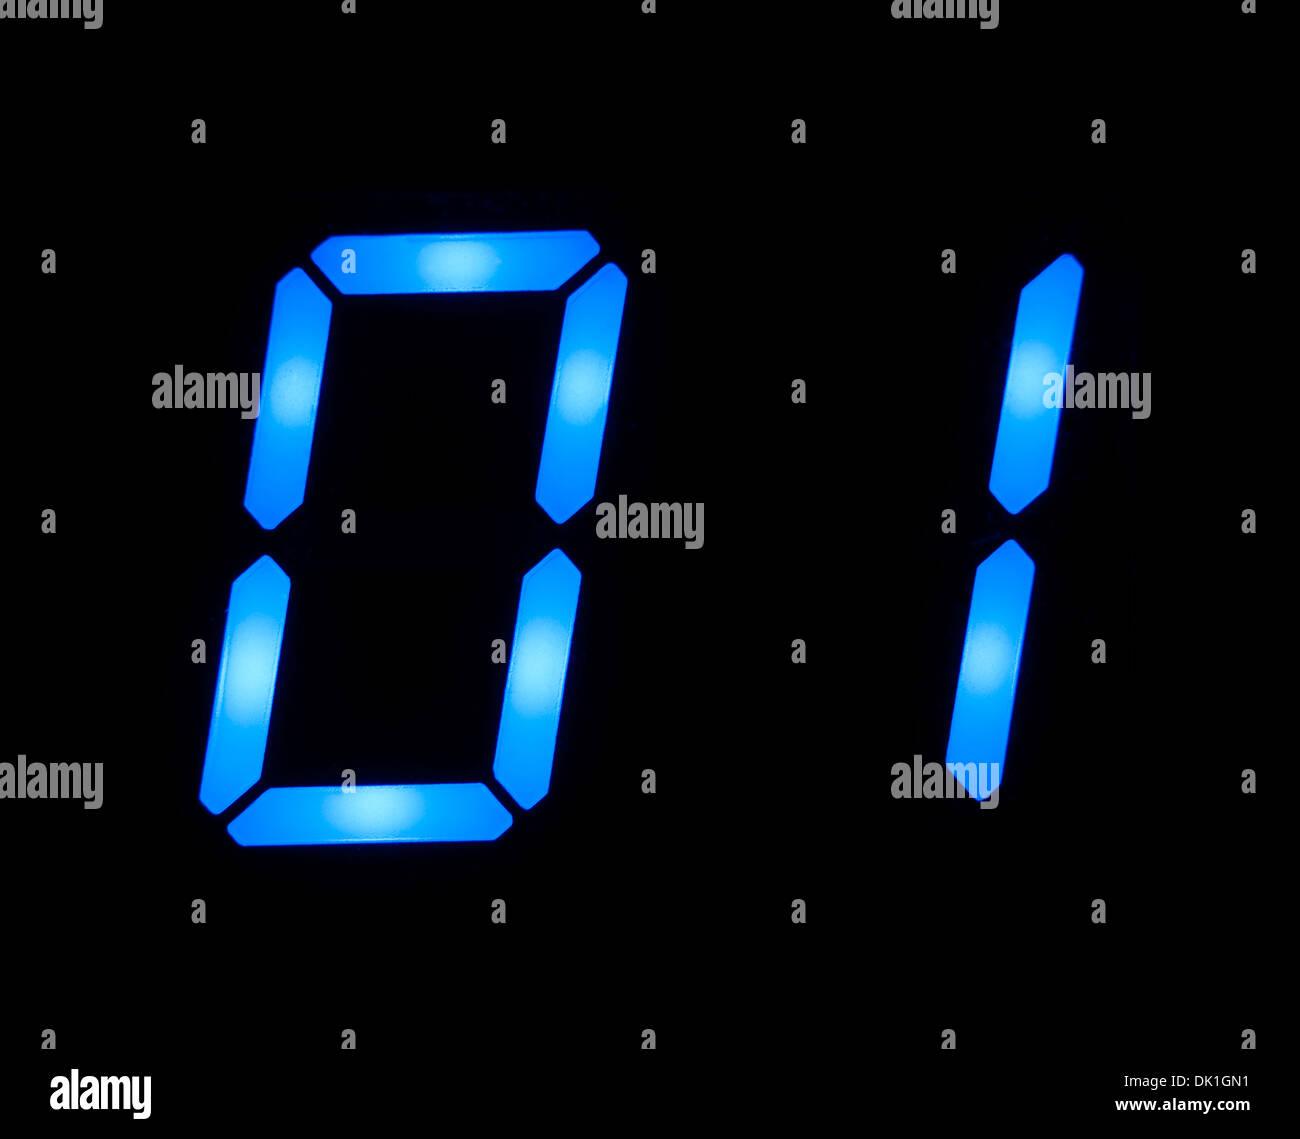 Matrix Falling Code Live Wallpaper Digits 0 1 Stock Photos Amp Digits 0 1 Stock Images Alamy